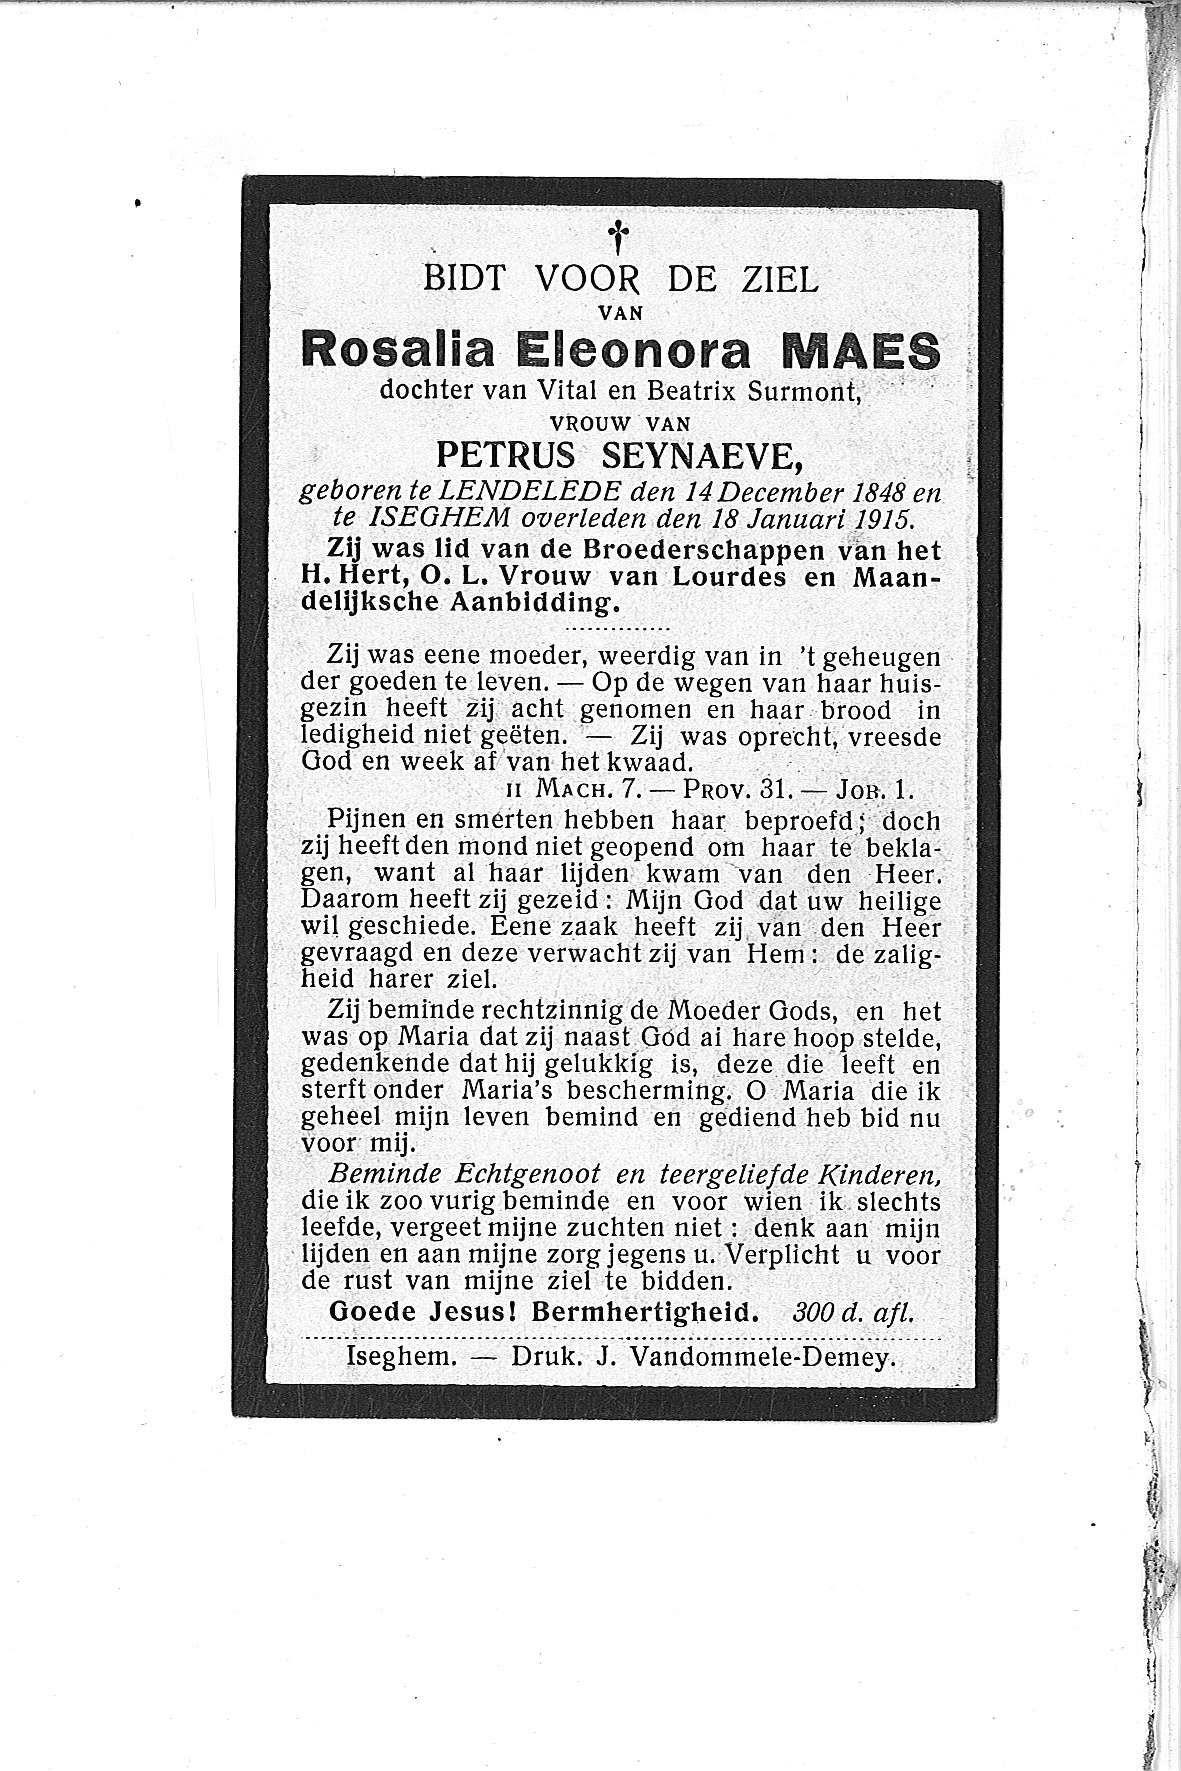 Rosalia-Eleonora(1915)20111110092539_00187.jpg